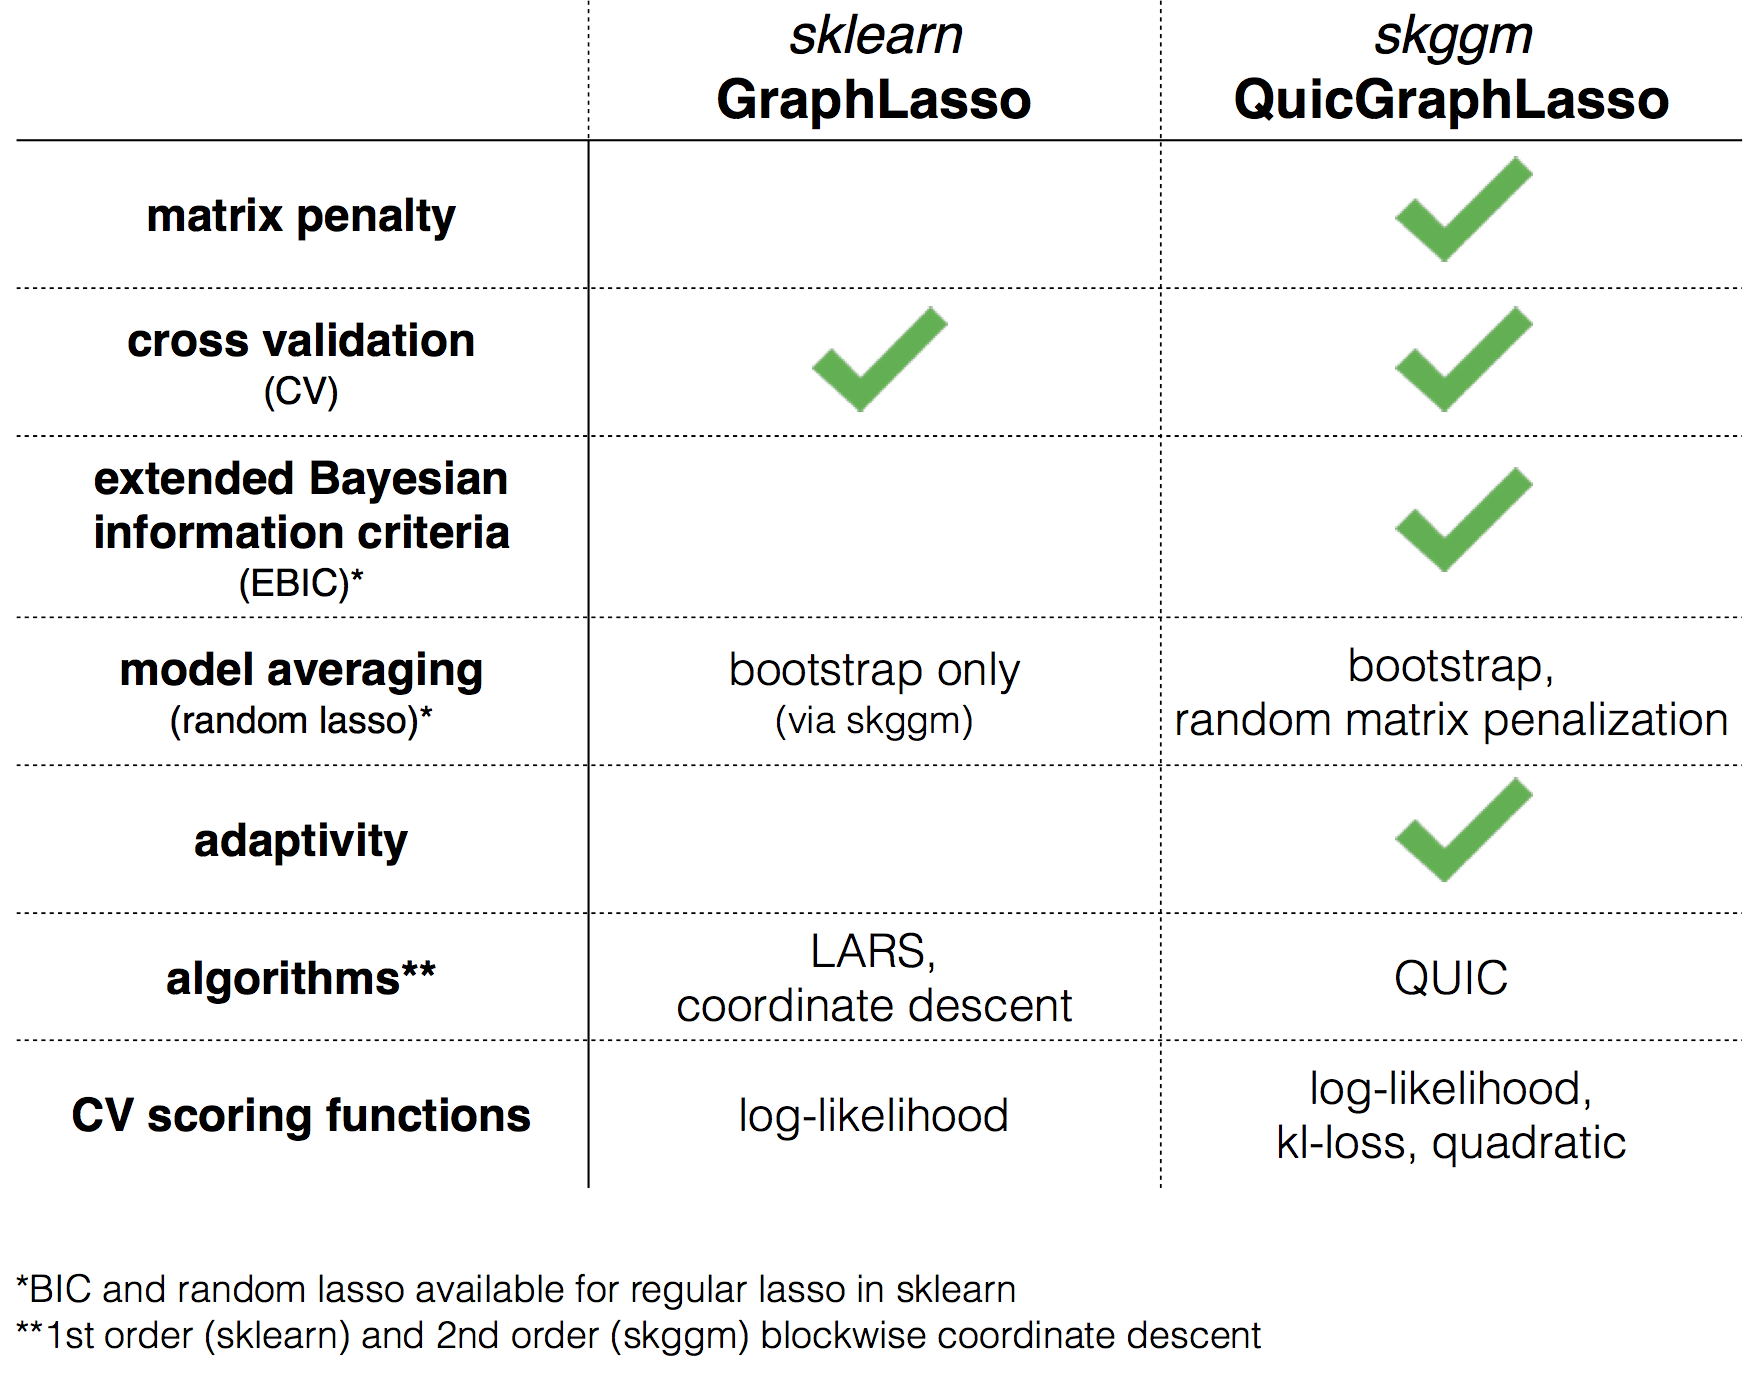 sklearn/skggm feature comparison